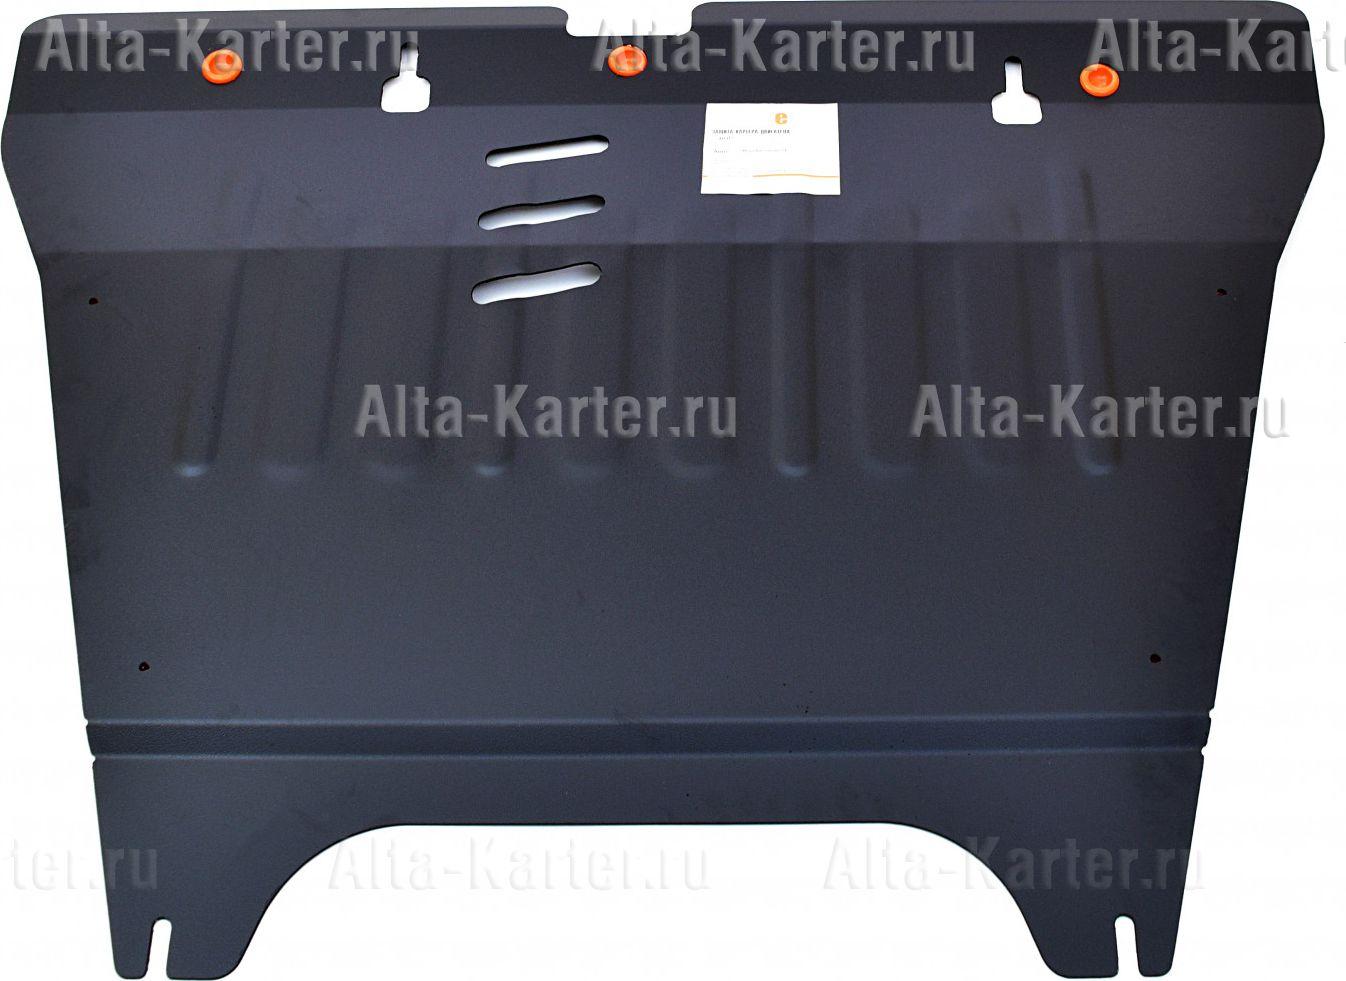 Защита Alfeco для картера и КПП Hyundai Grandeur IV 2006-2011. Артикул ALF.10.07